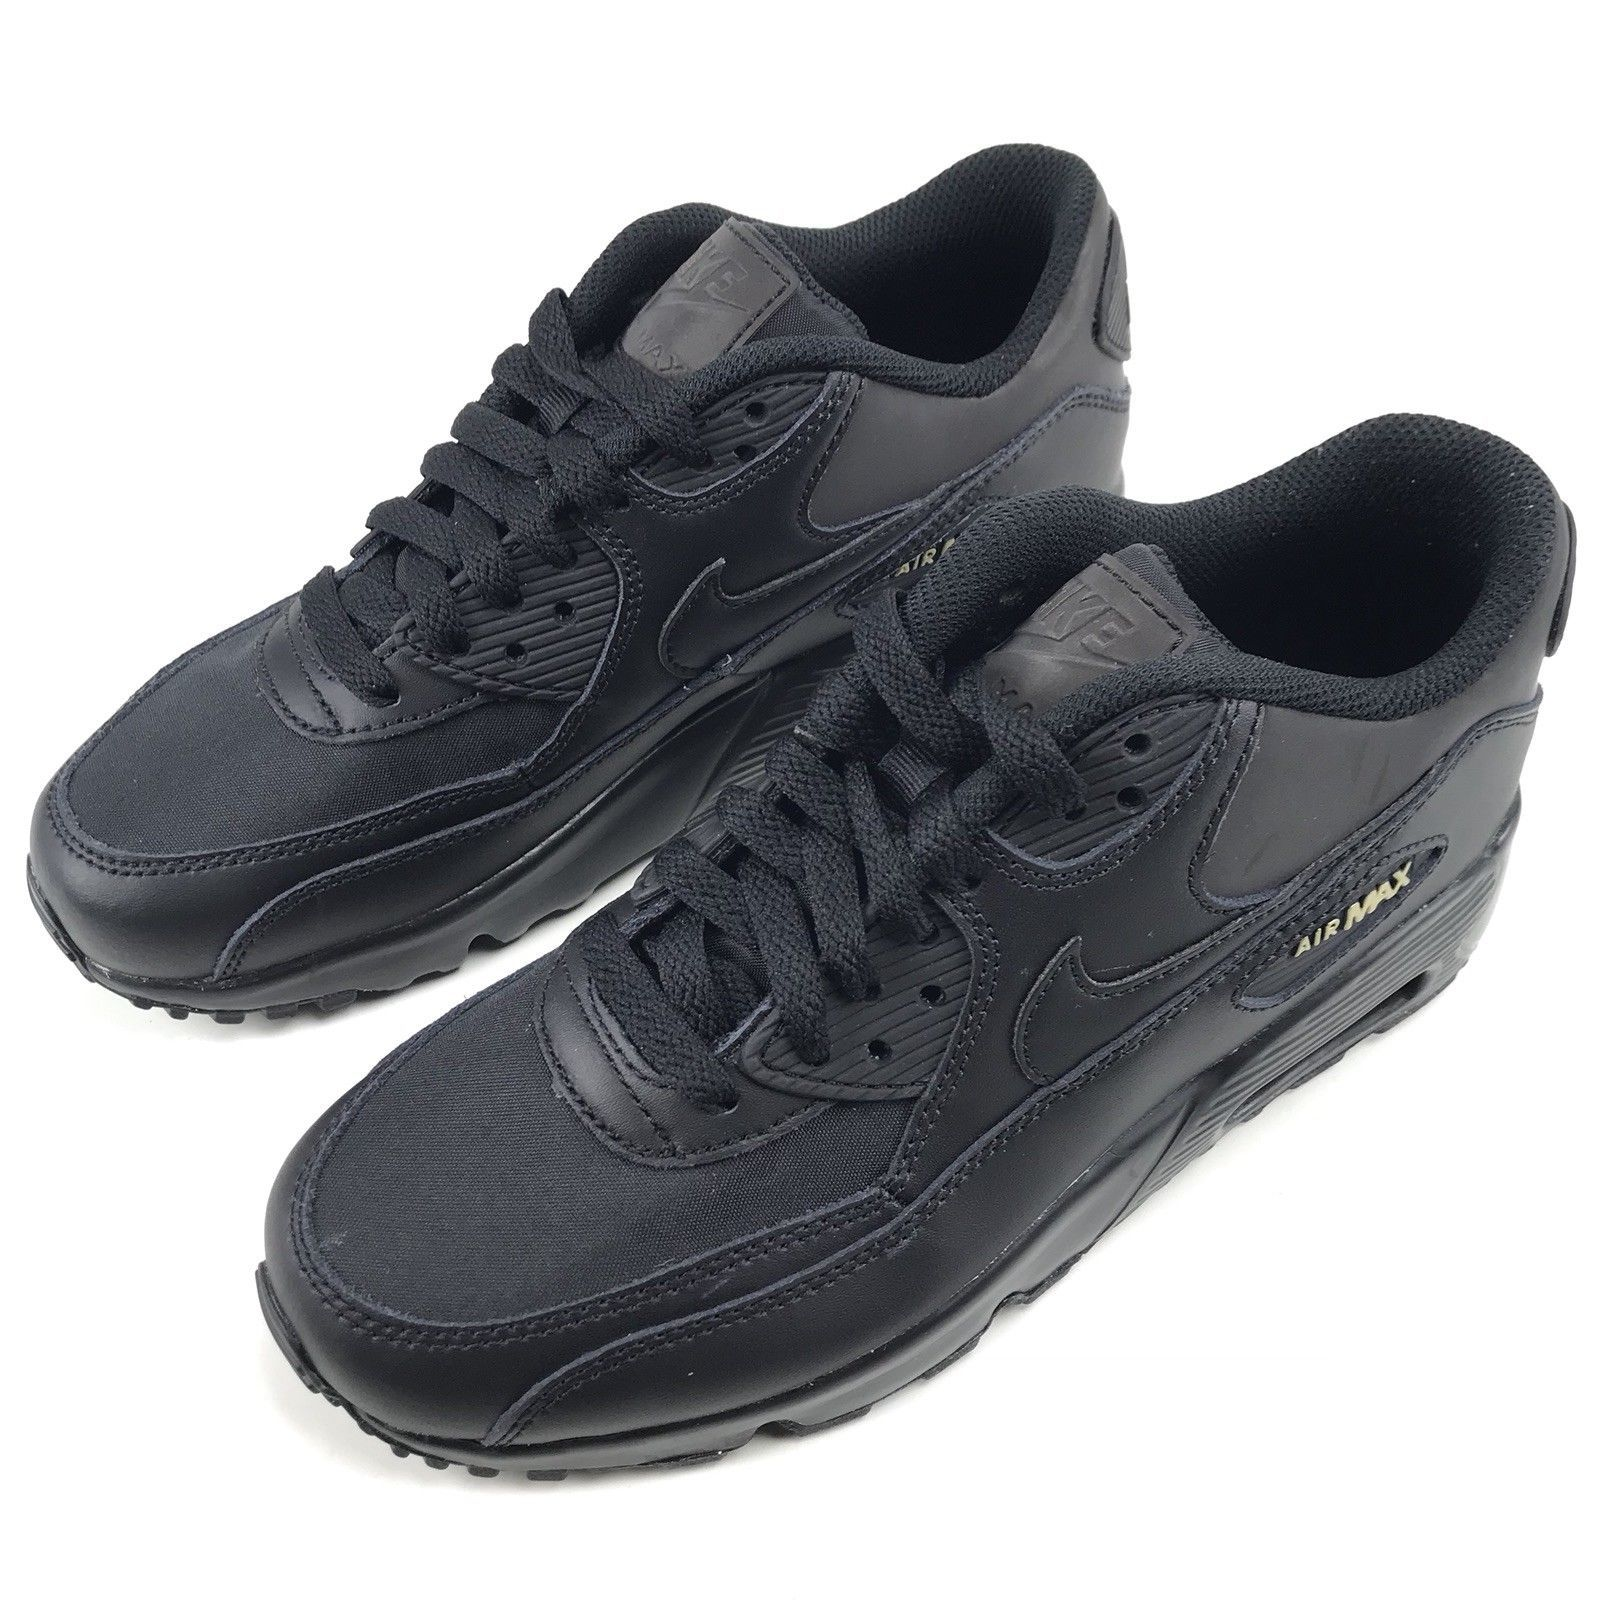 buy online 49171 372cd Nike Air Max 90 Premium Women s Size 7   Boys Size 5.5Y Black Gold AH9345